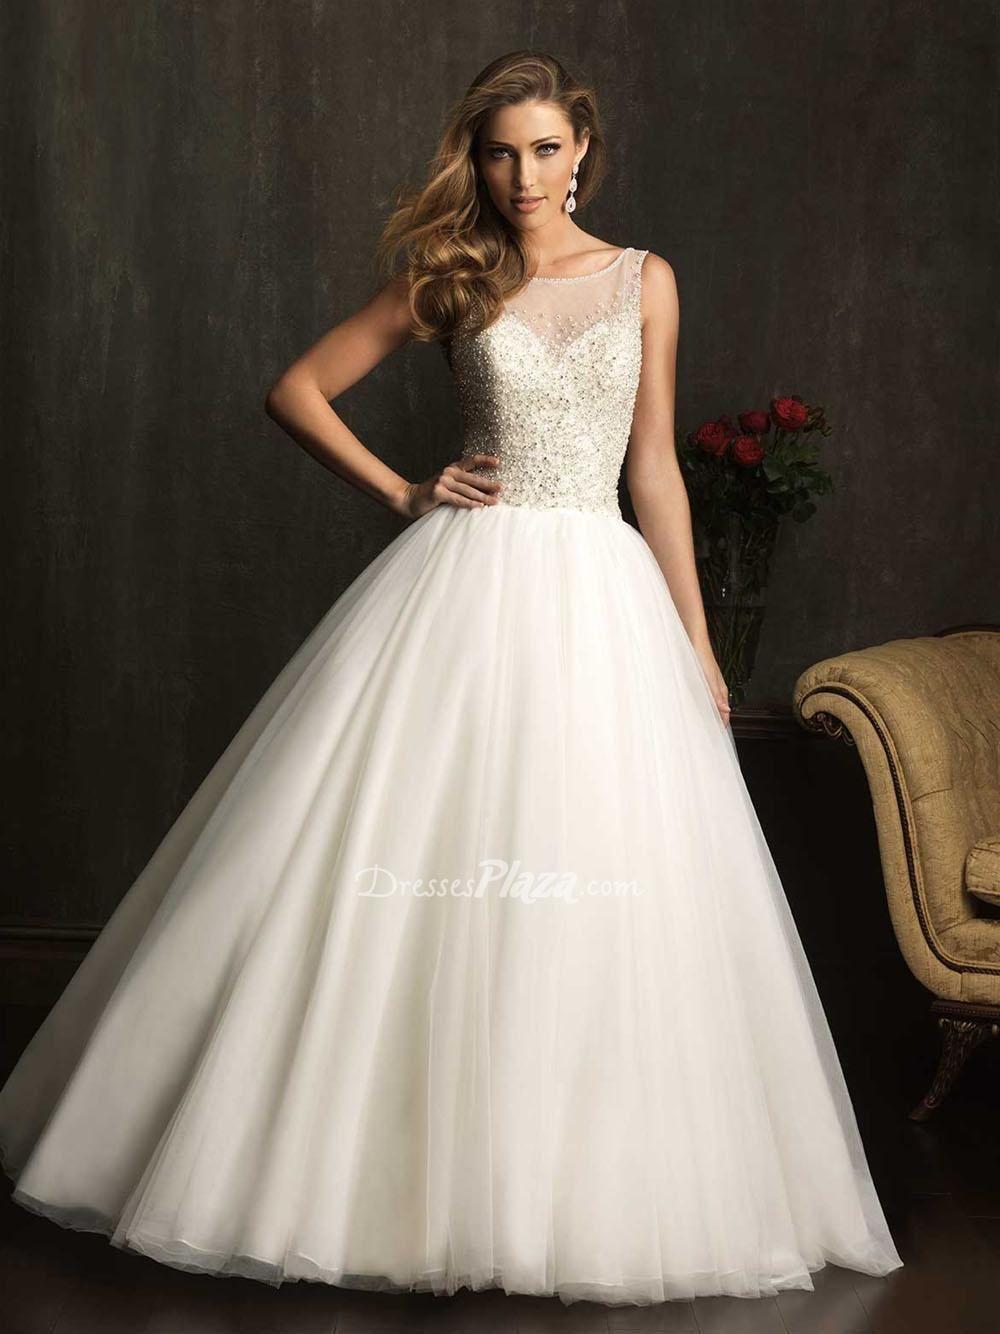 ball gown wedding dress elaborate ball gown sheer boat neck beaded bodice sleeveless wedding dress 00 0ff